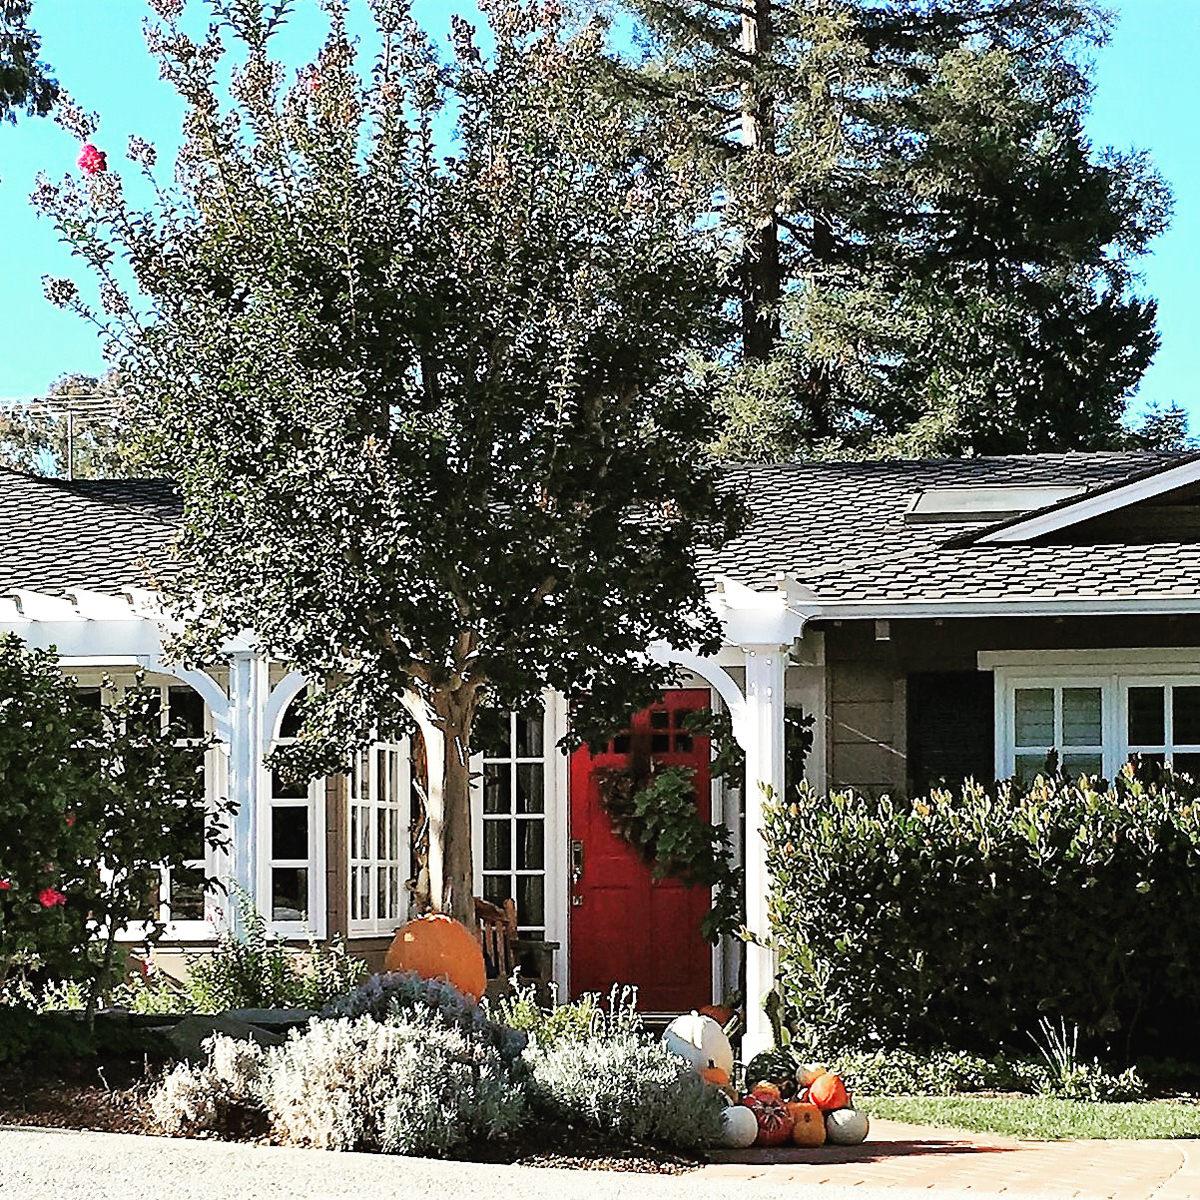 menlo-park-california-remodel-exterior-interior-design-montgomery-home.jpg